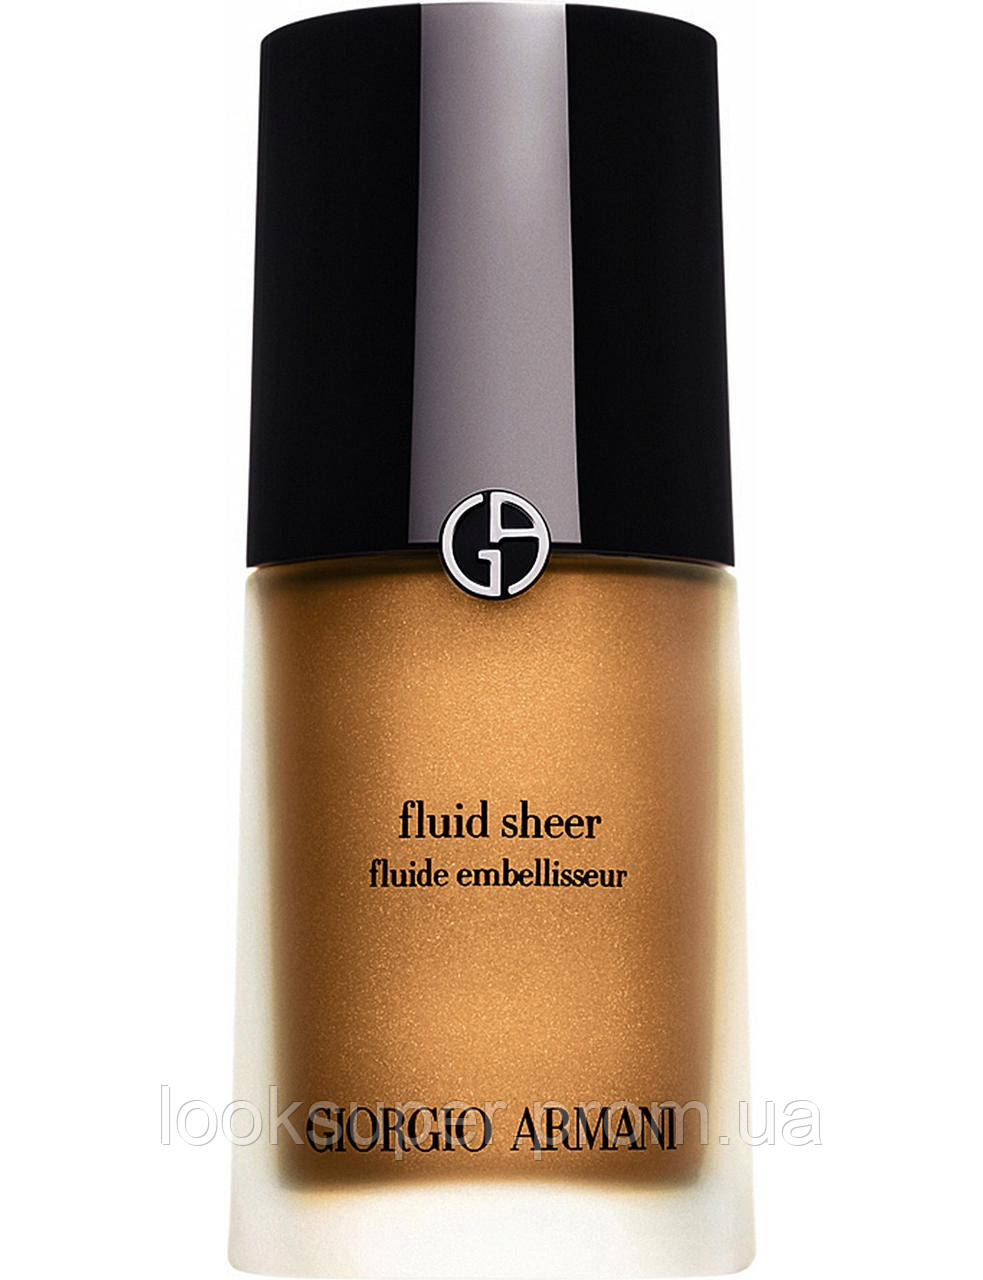 Иллюминатор GIORGIO ARMANI Fluid Sheer Skin Illuminator 14